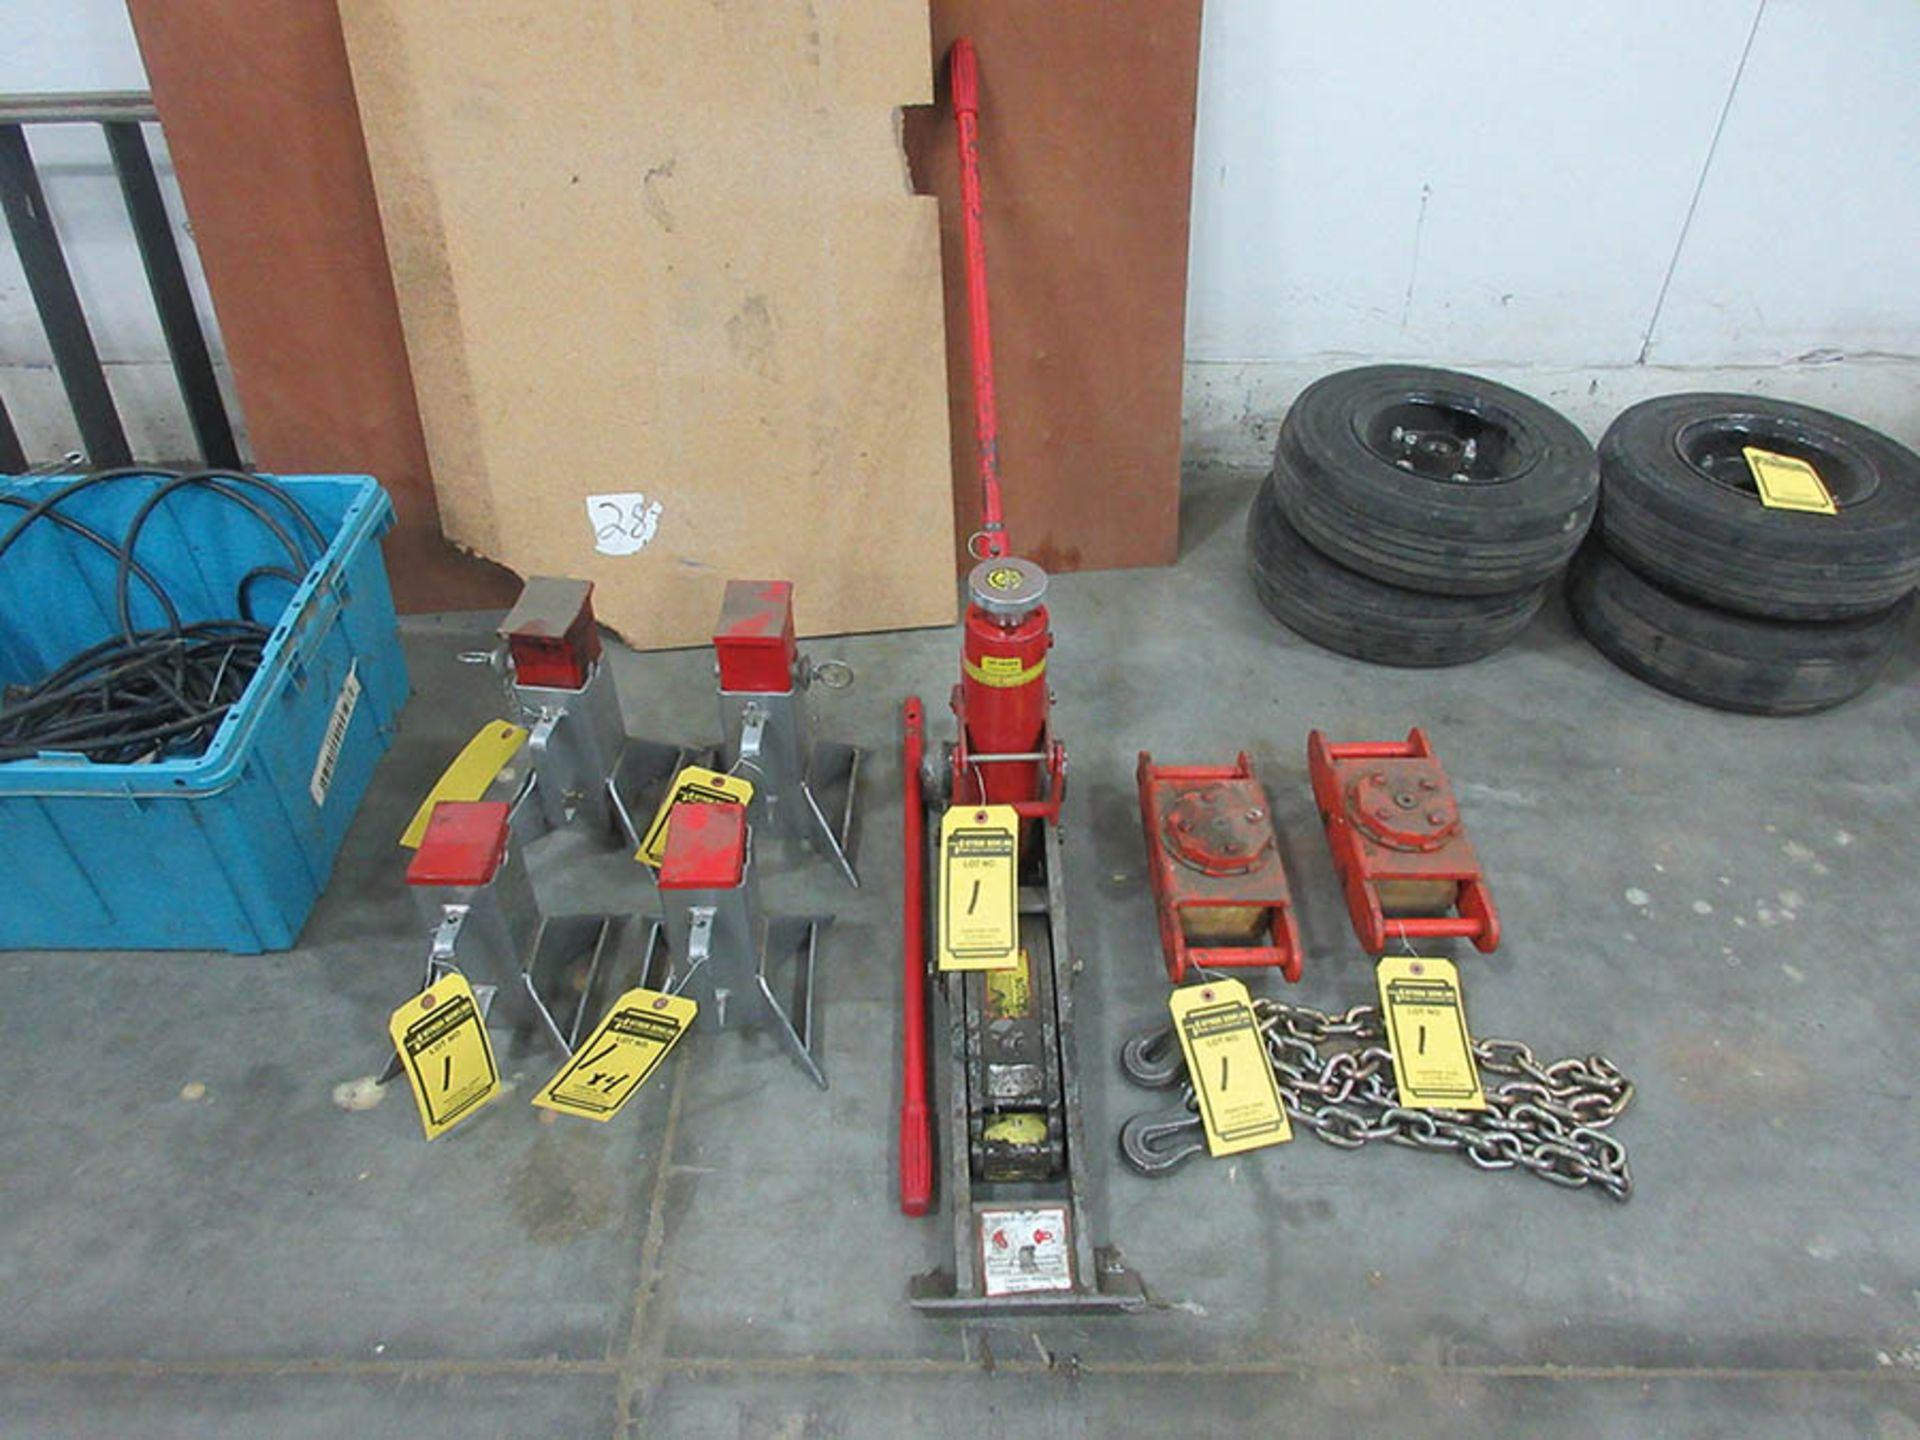 Lot 1 - (2) MULTITON MACHINE SKATES, 4-TON HYDRAULIC JACK, (4) 7-TON JACK STANDS